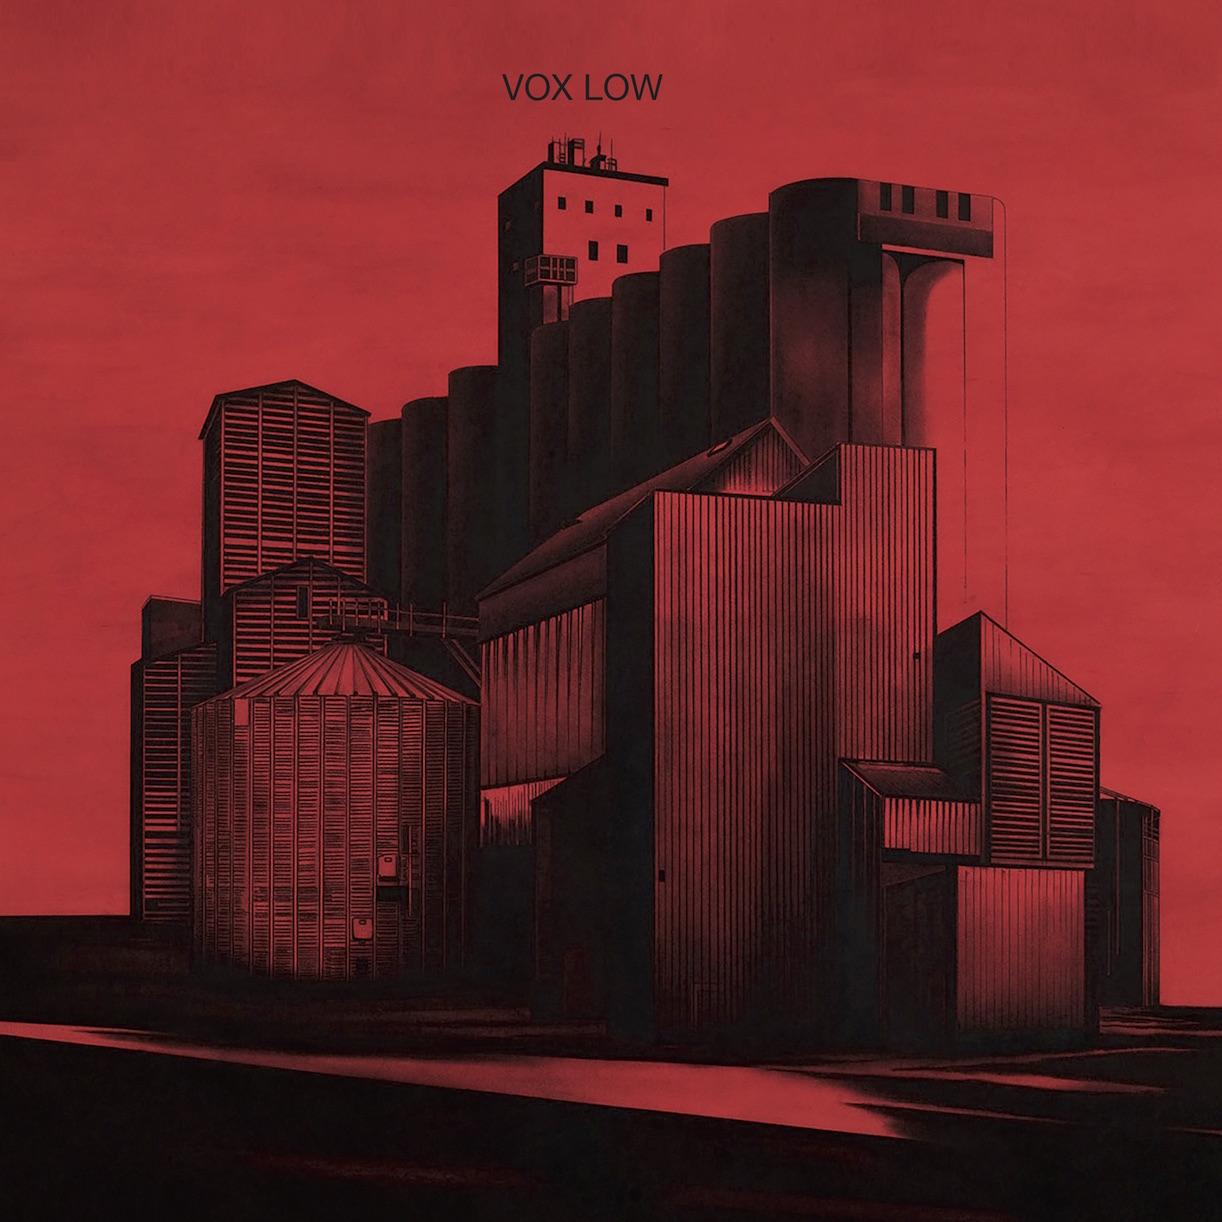 Vox Low – Vox Low